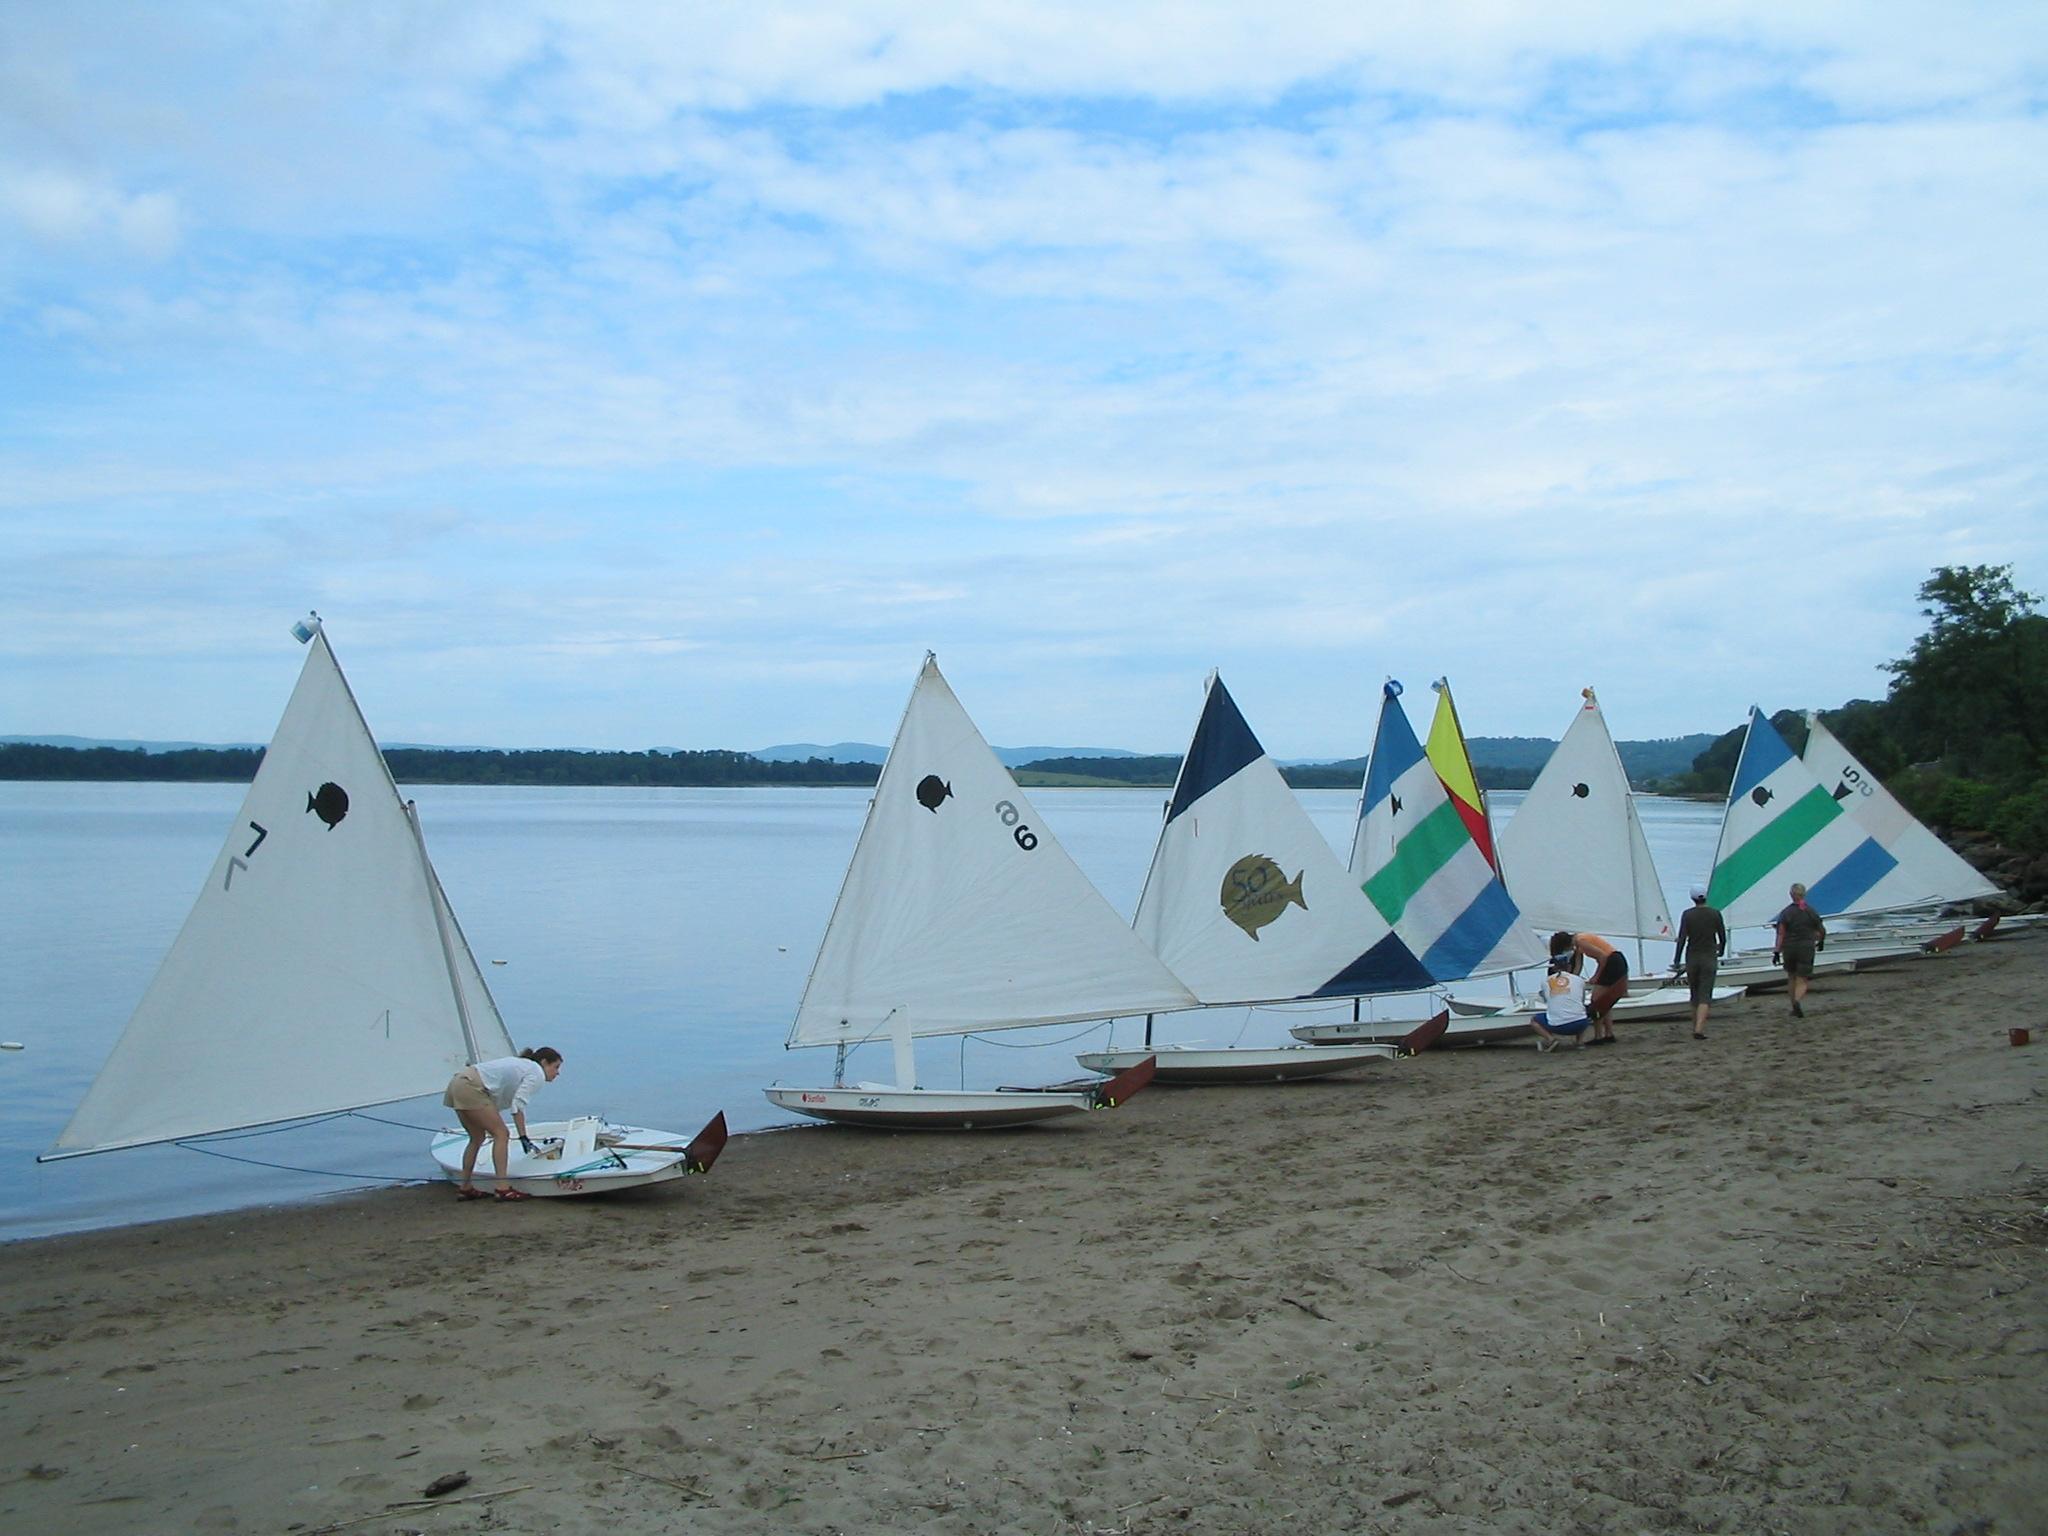 Shattemuc Beach